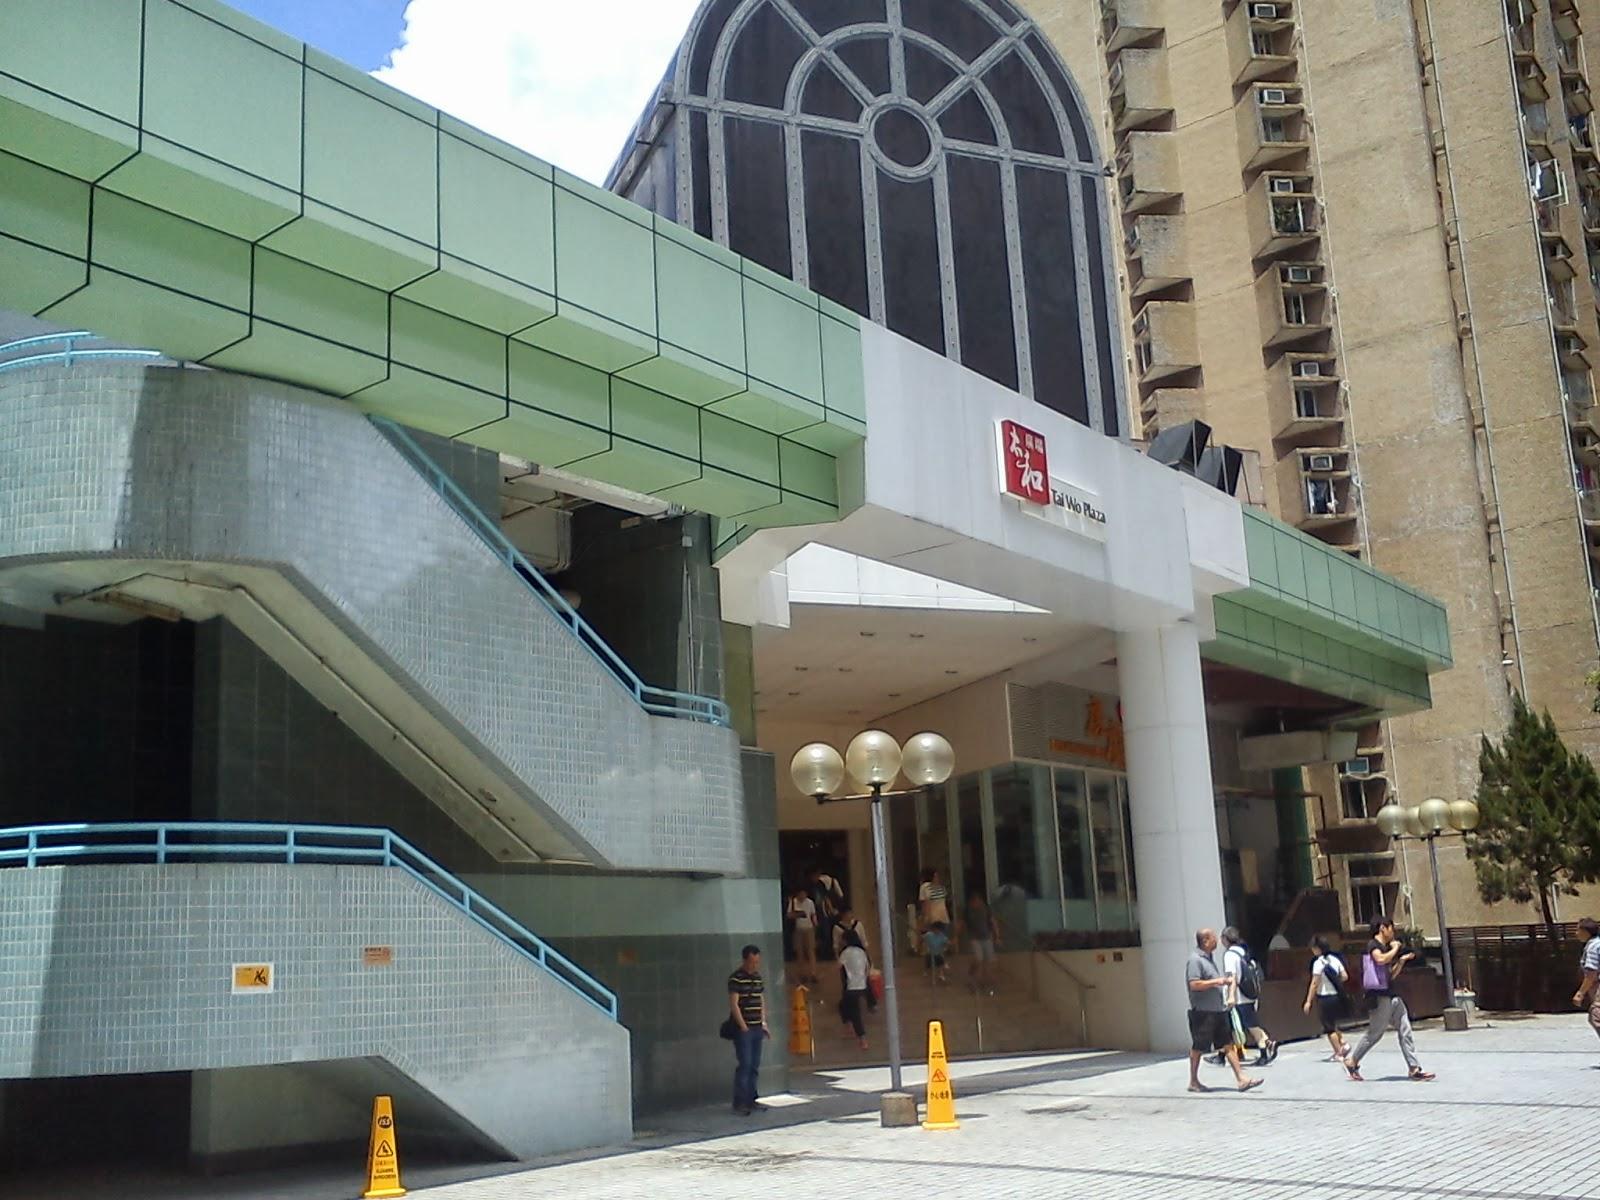 Grassroots O2: [領匯商場] 太和廣場 @2012-07-07